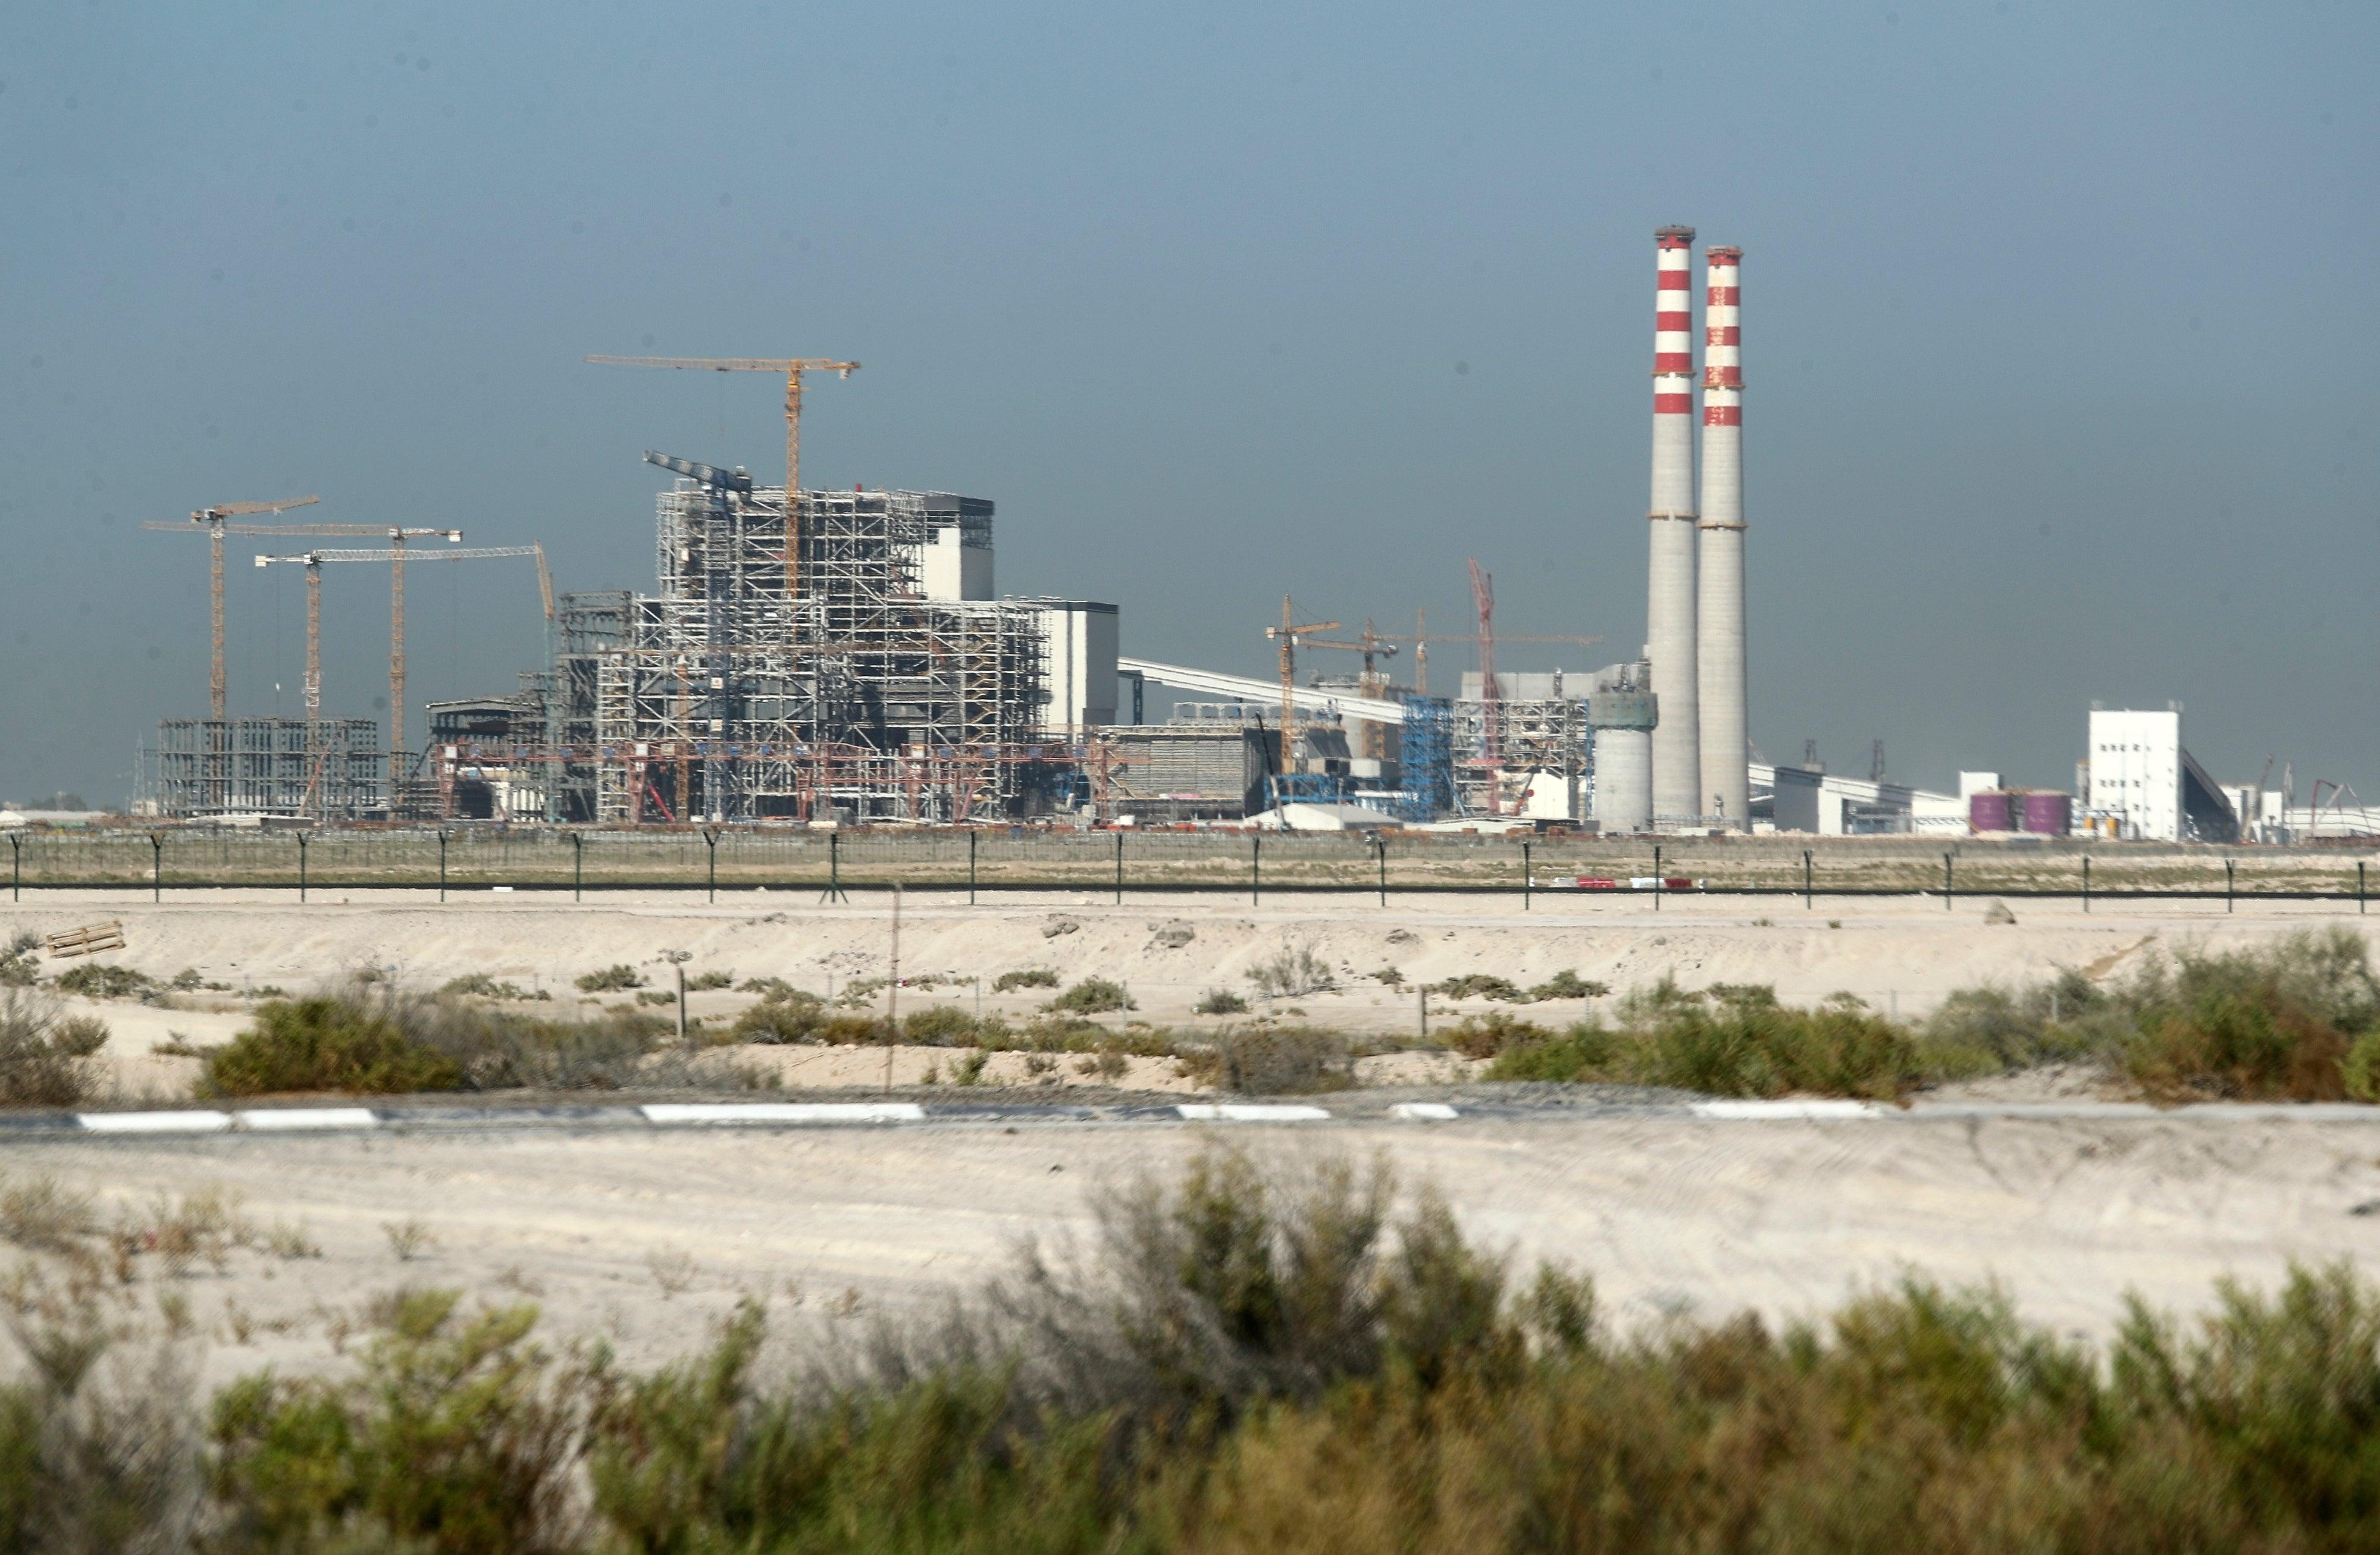 Dubai builds first coal power plant despite pledging world's lowest carbon footprint by 2050